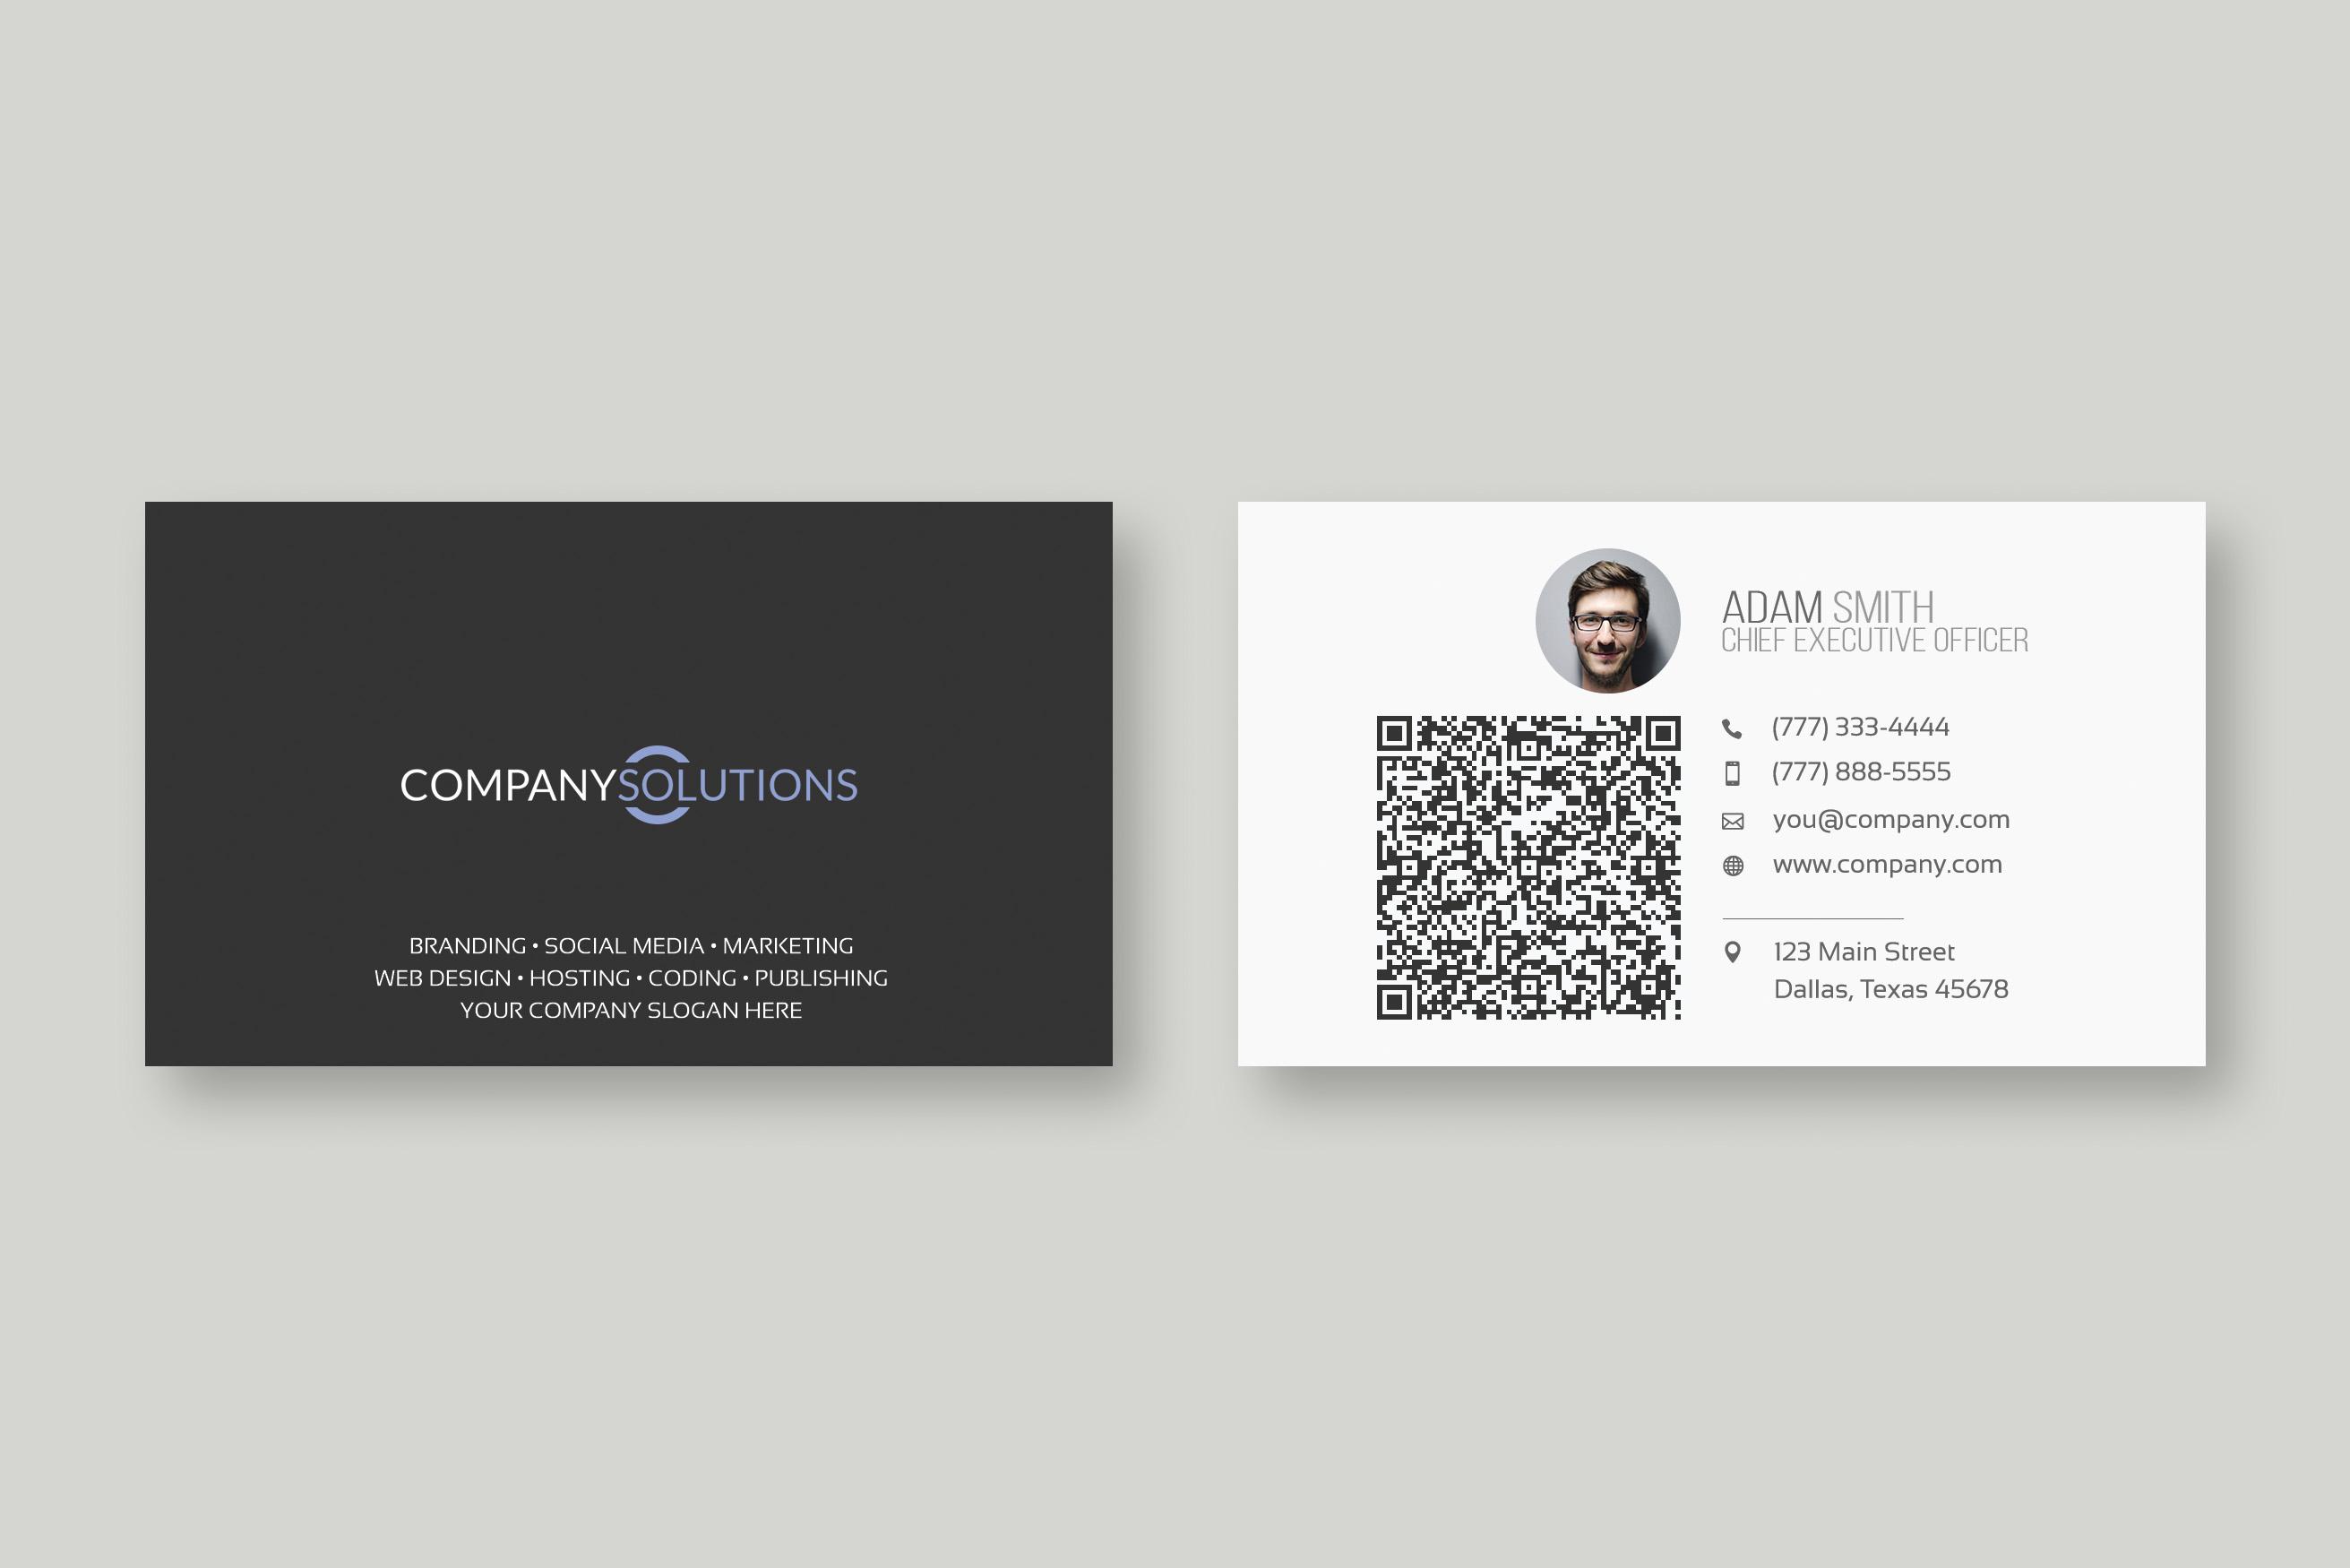 Modern Qr Code Business Card Template Intended For Qr Code Business Card Template